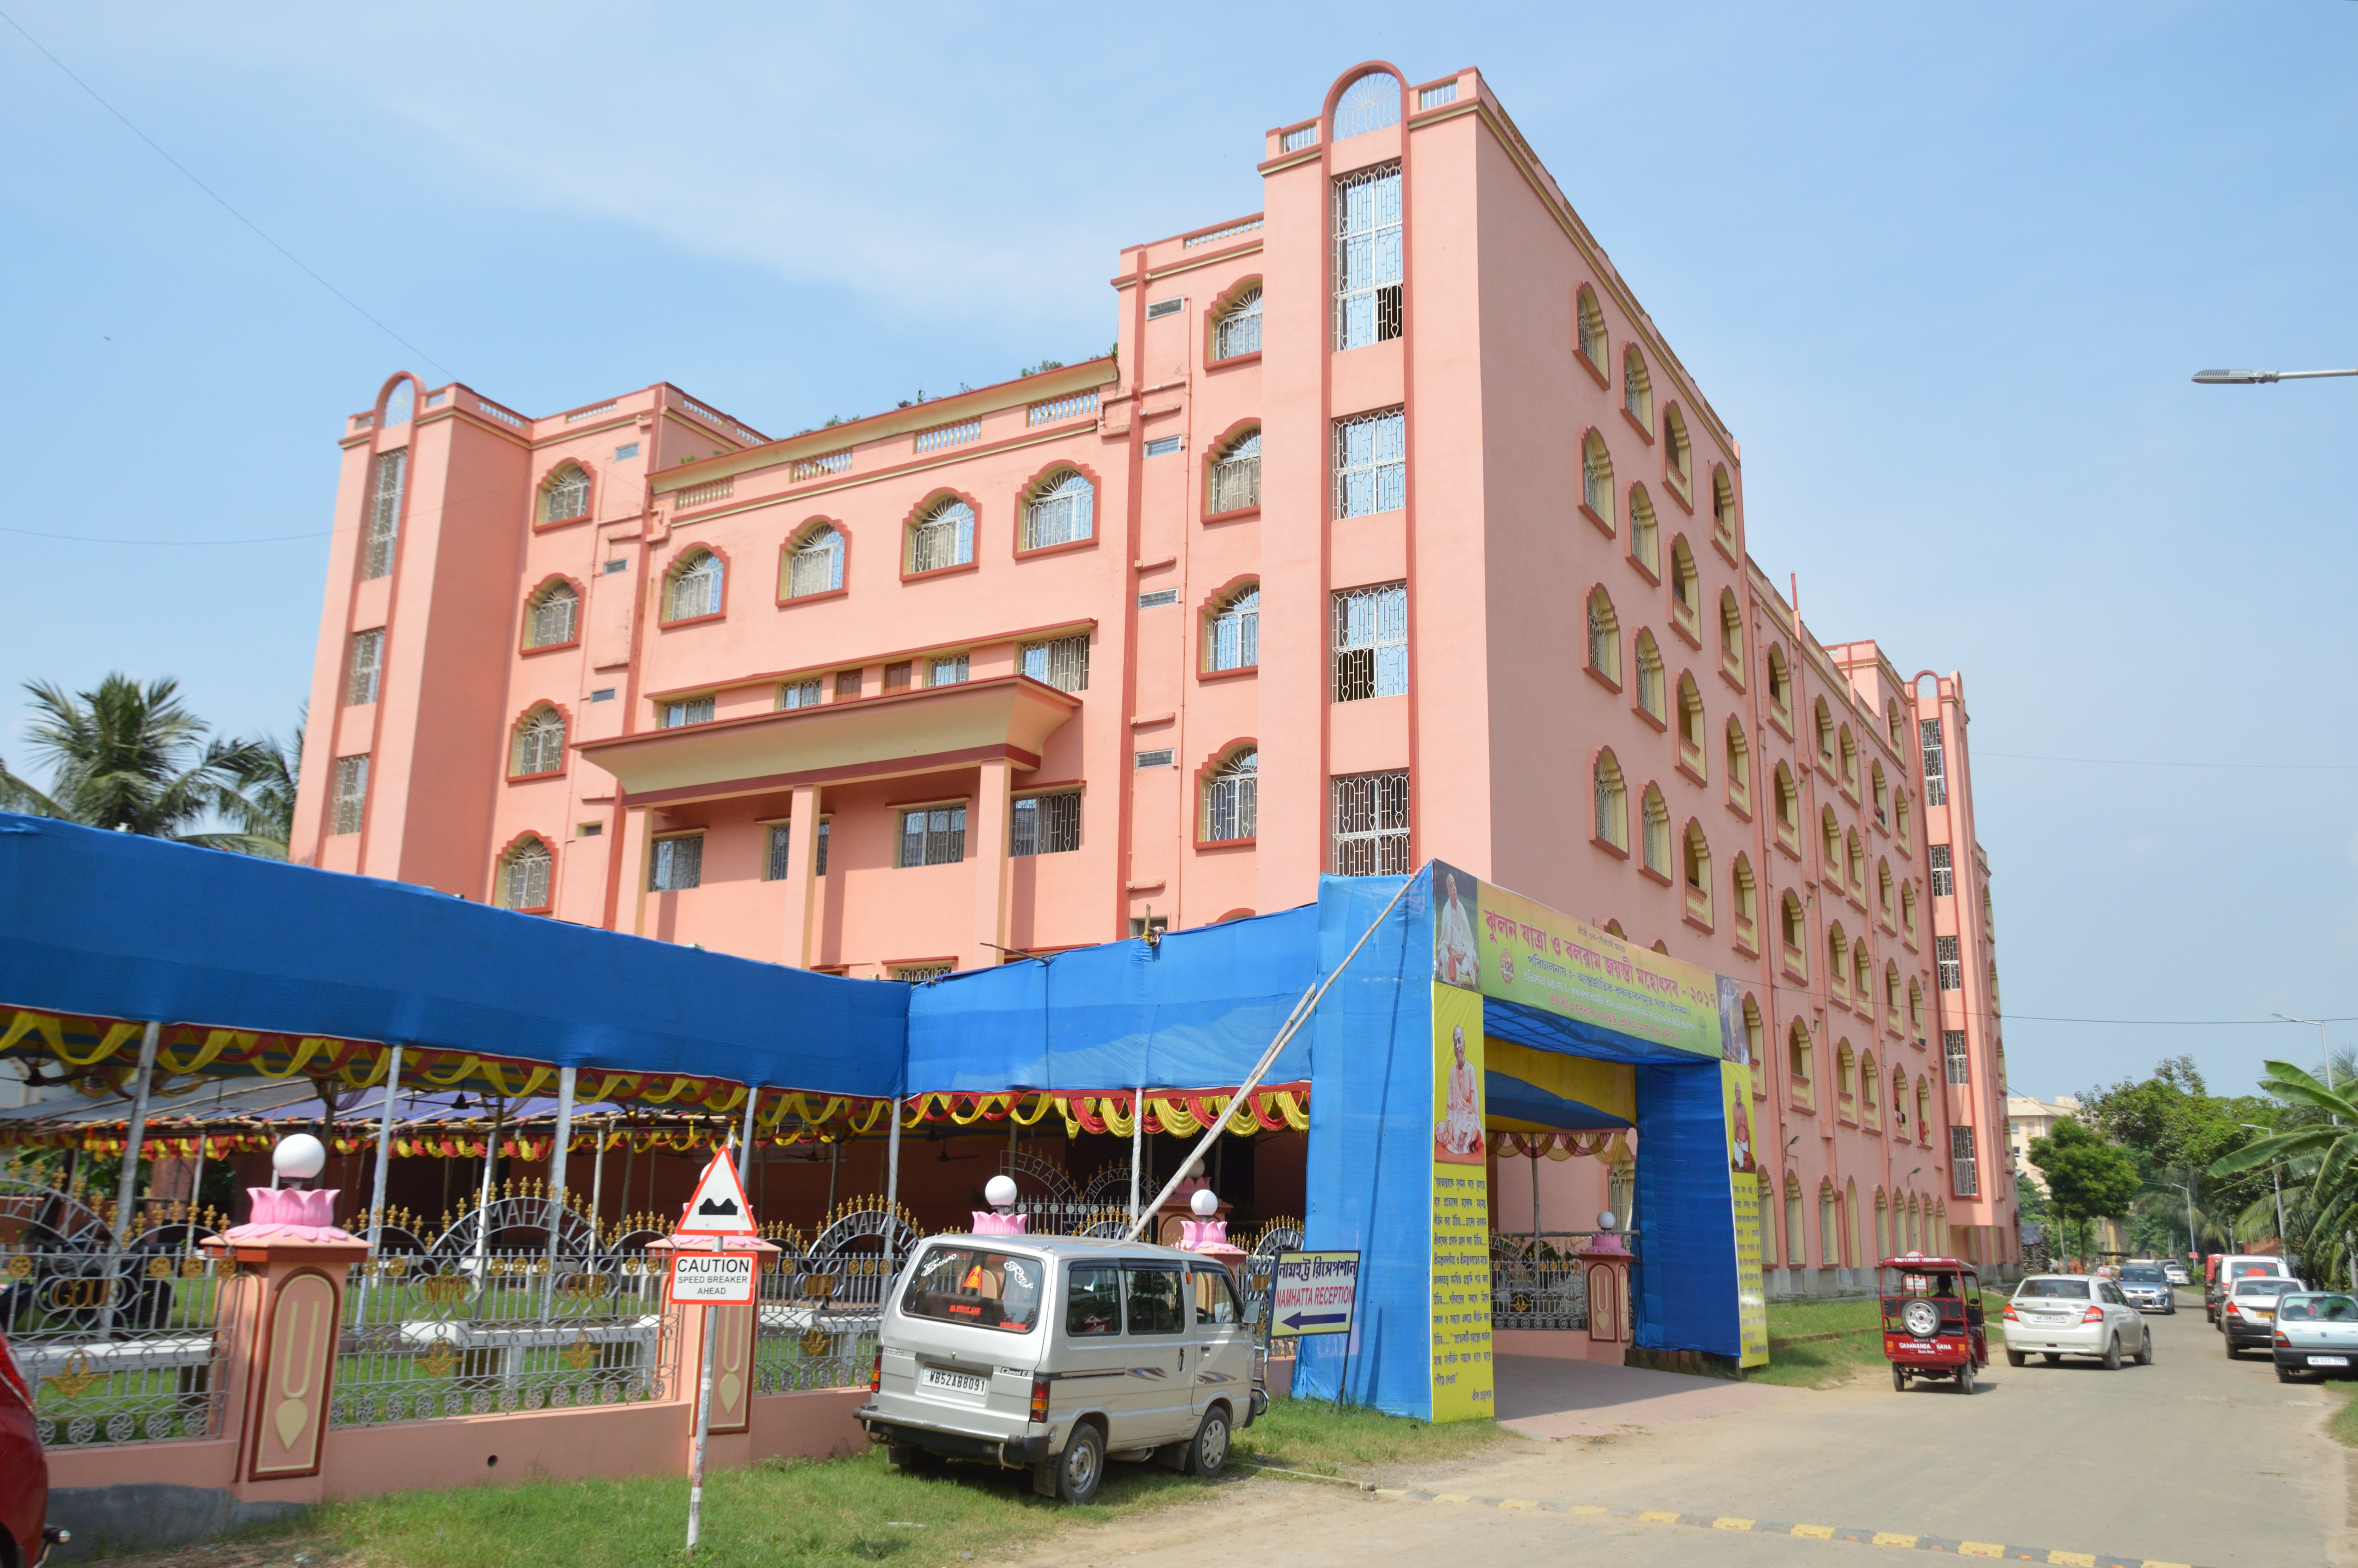 File:Namahatta Bhavan - ISKCON Campus - Mayapur - Nadia 2017-08-15